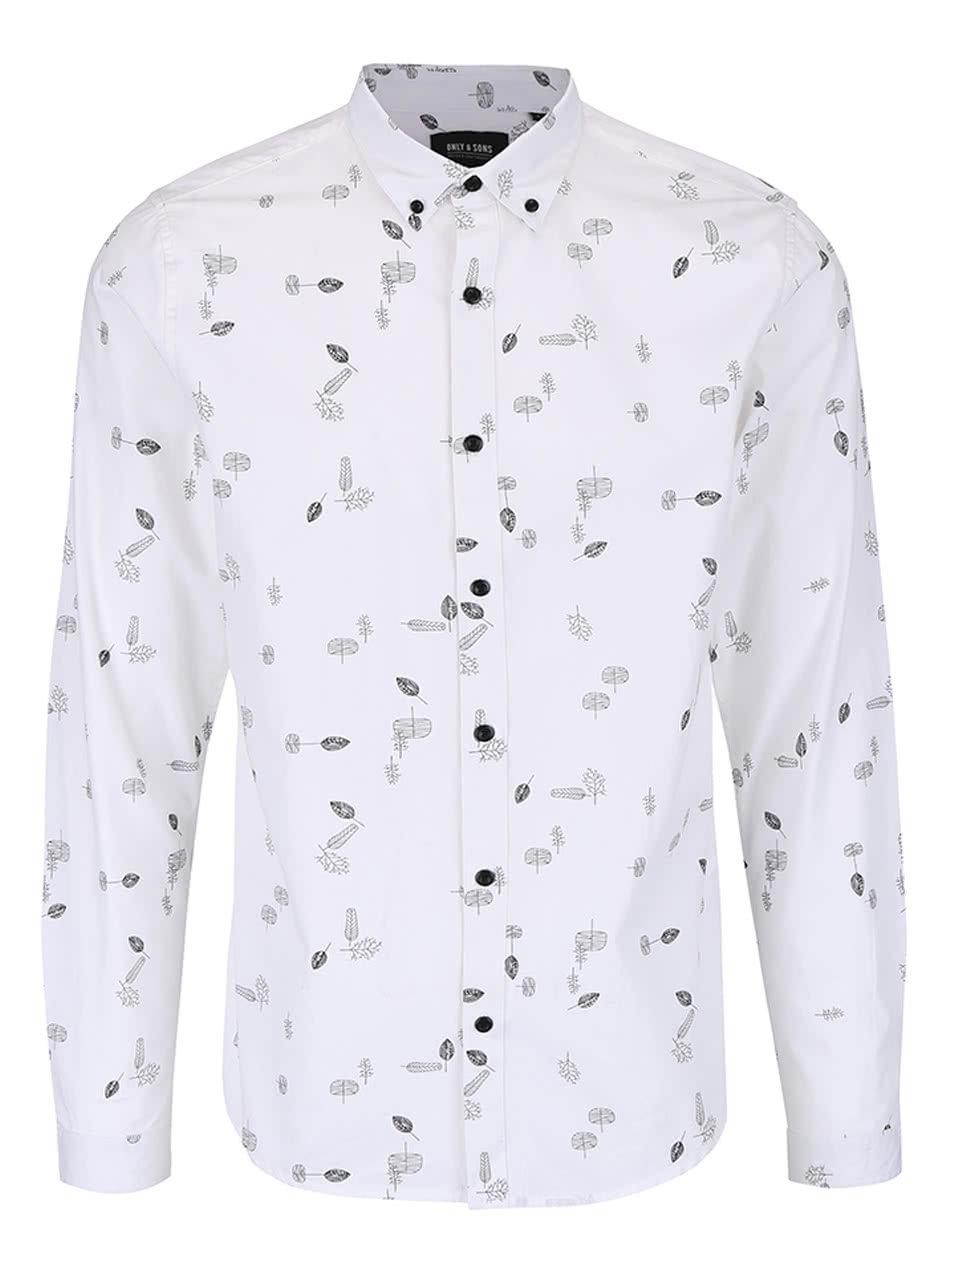 d577cca2c1f7 Bílá vzorovaná slim fit košile ONLY   SONS Bob ...